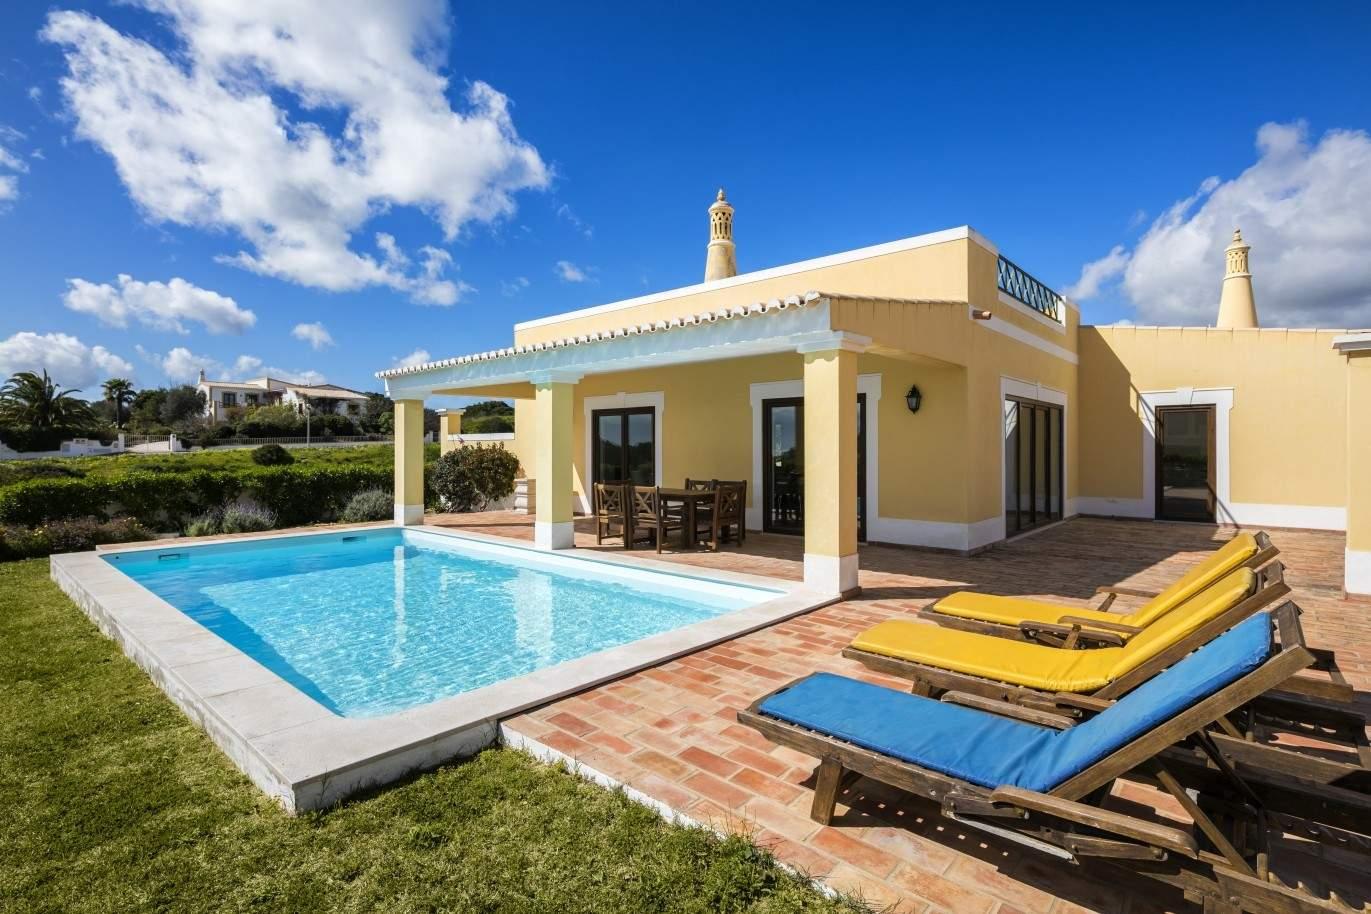 villa-zum-verkauf-mit-pool-nahe-dem-strand-lagos-algarve-portugal